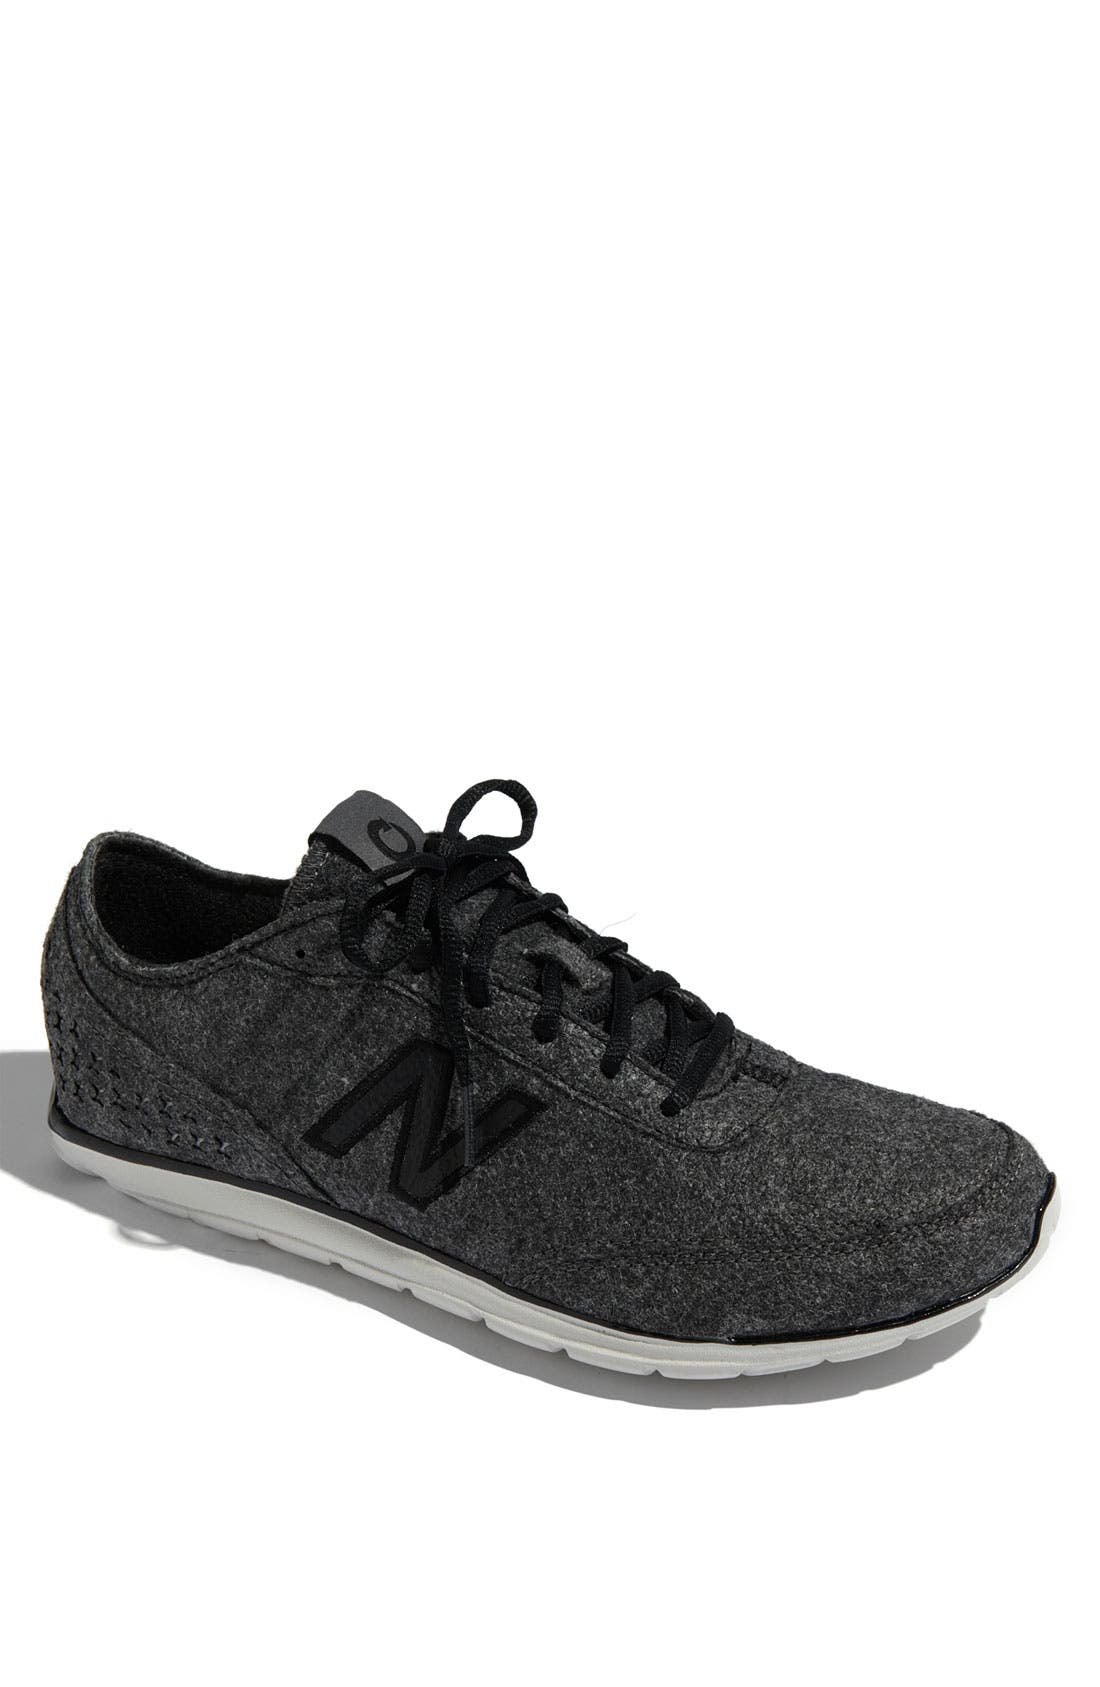 Main Image - New Balance 'newSKY' Sneaker (Men)